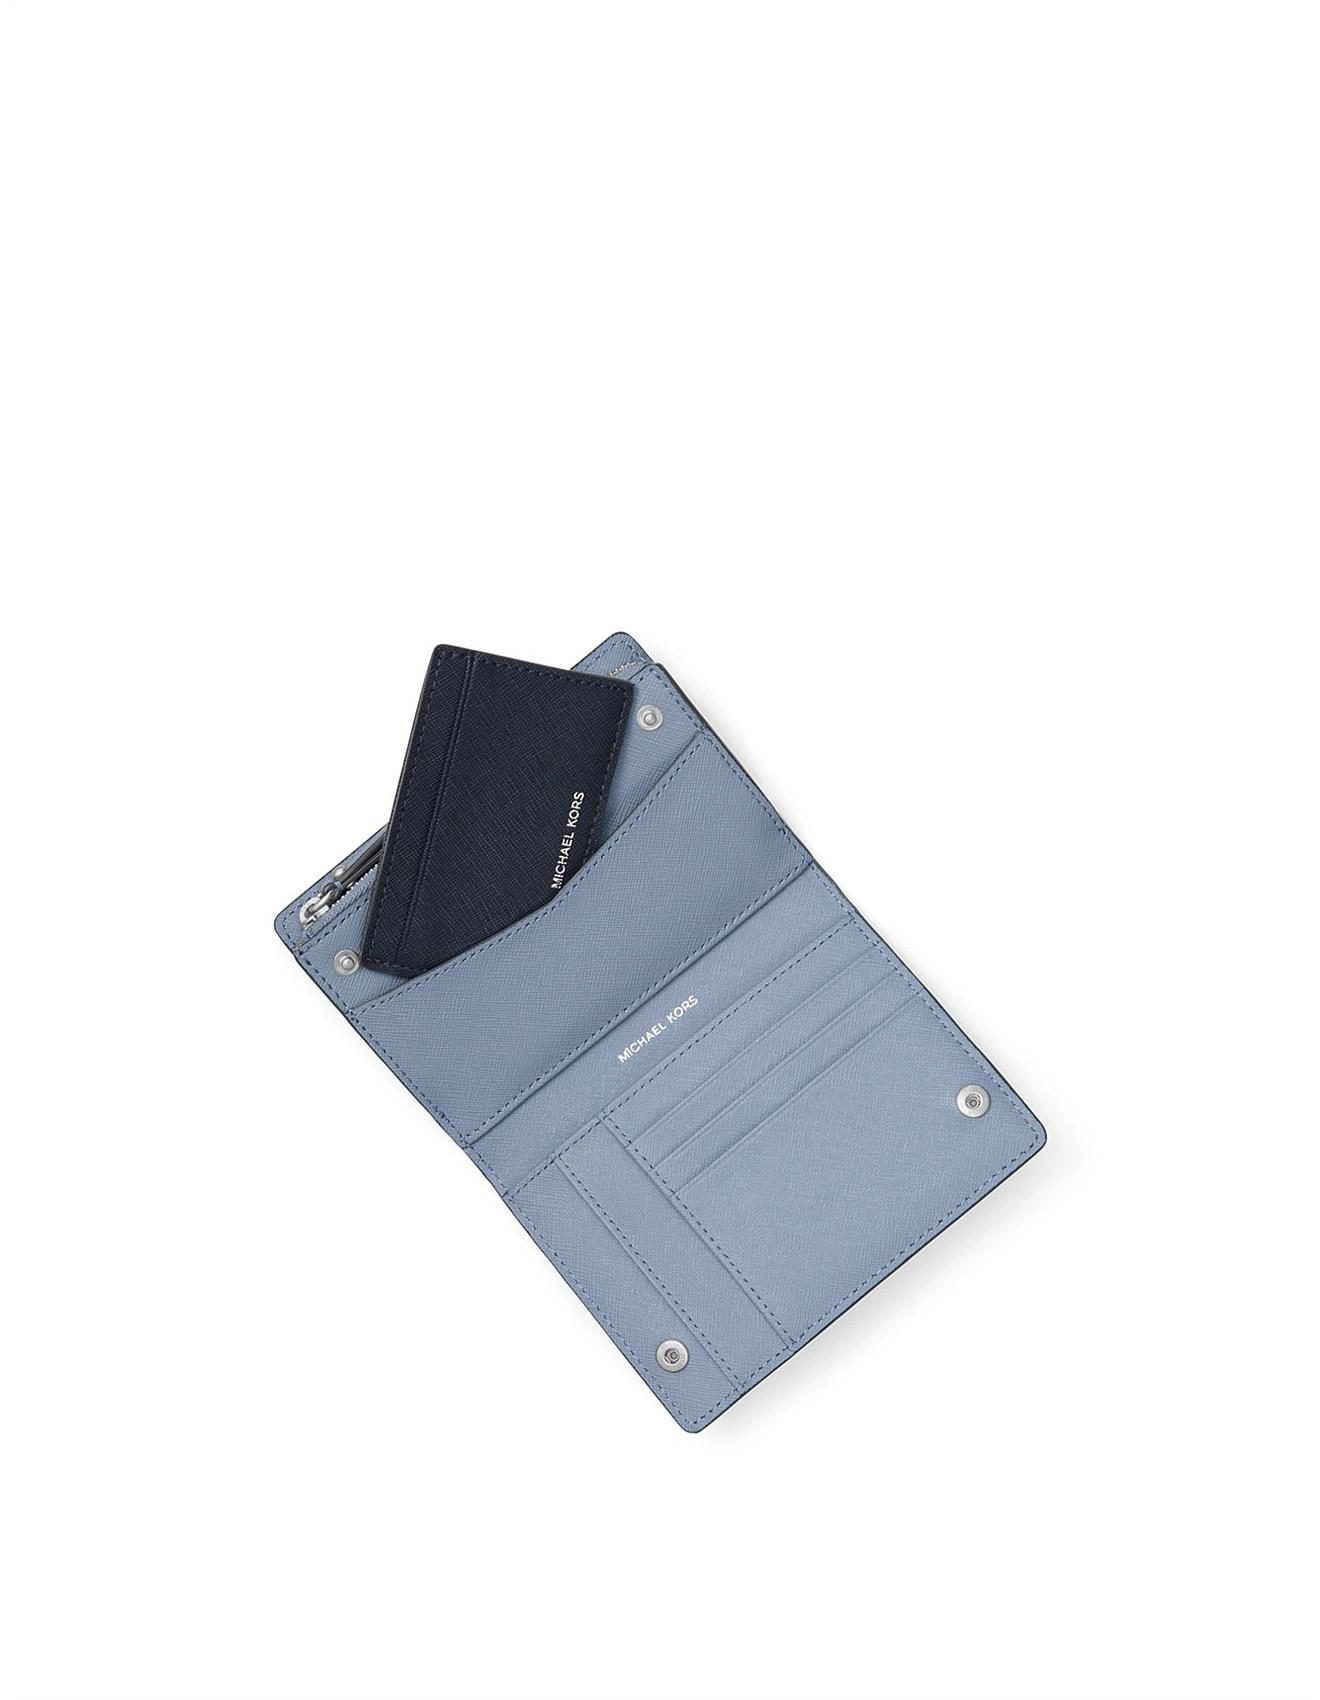 1be52e1c348f Jet Set Medium Saffiano Leather Slim Wallet. 1